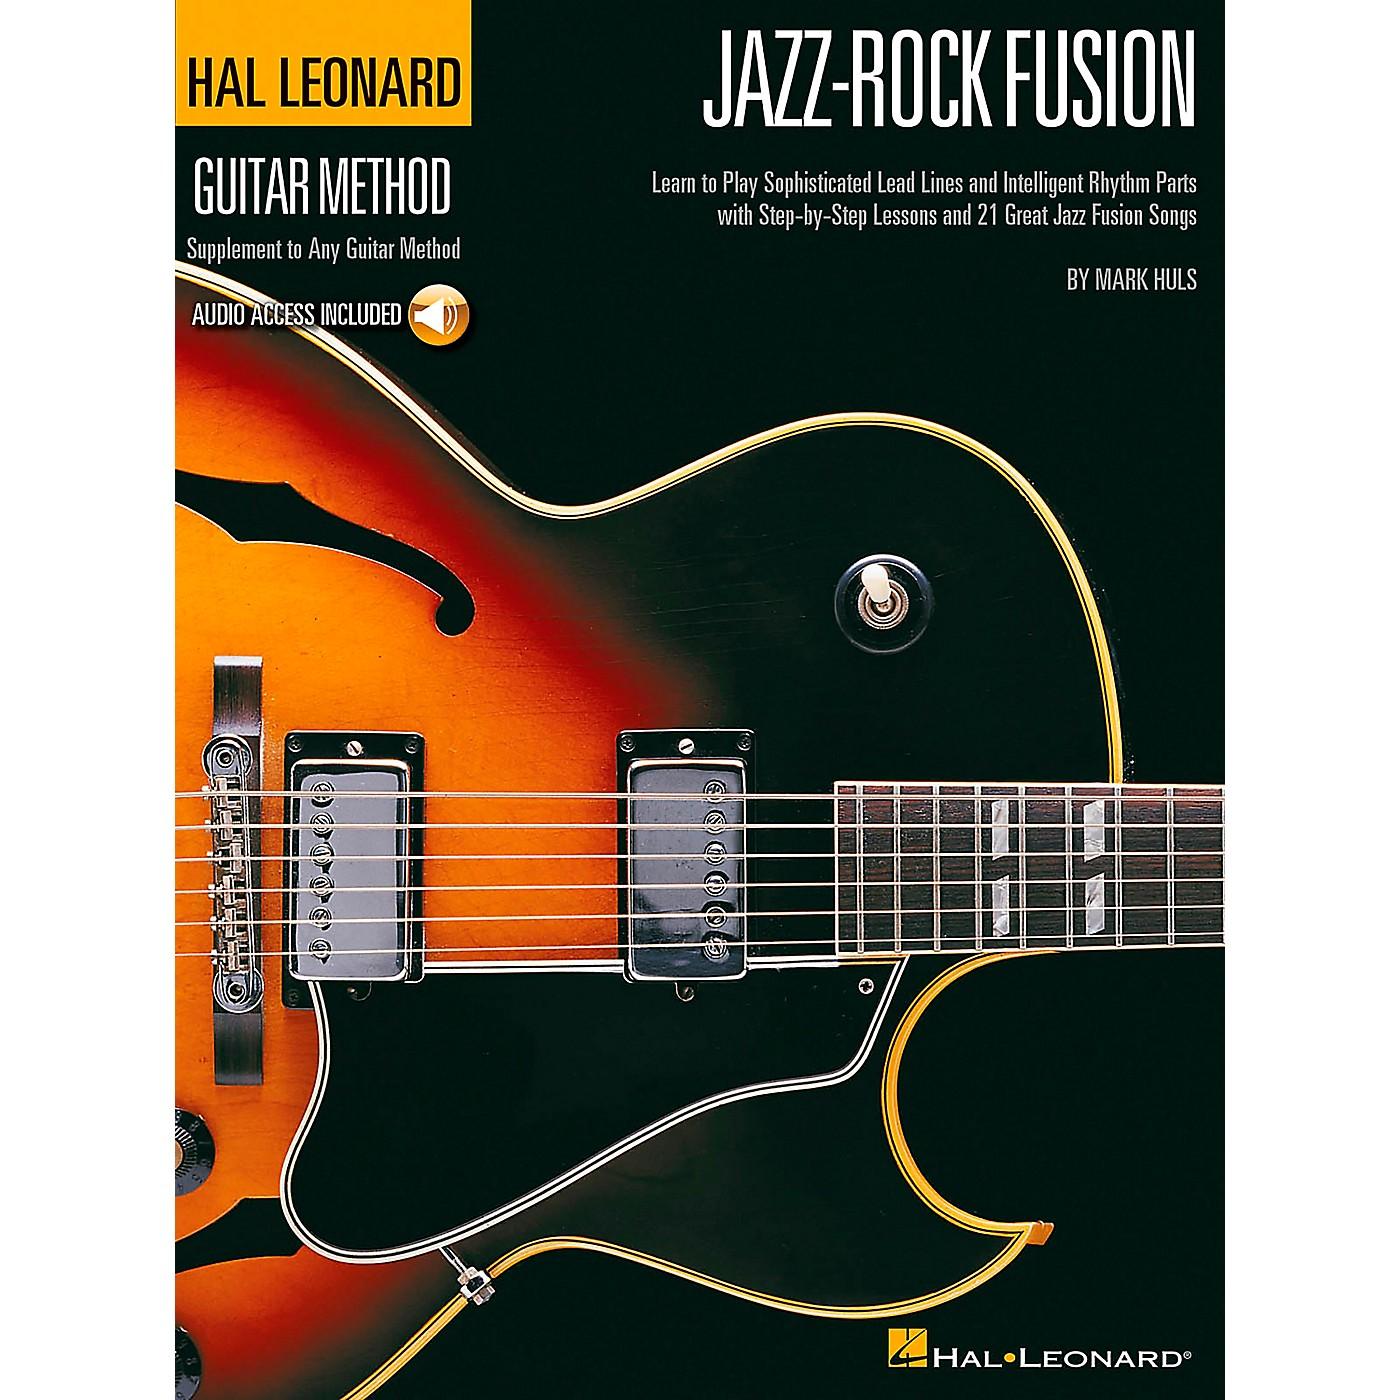 Hal Leonard Jazz-Rock Fusion Guitar Stylistic Supplement To The Hal Leonard Guitar Method Book/CD thumbnail